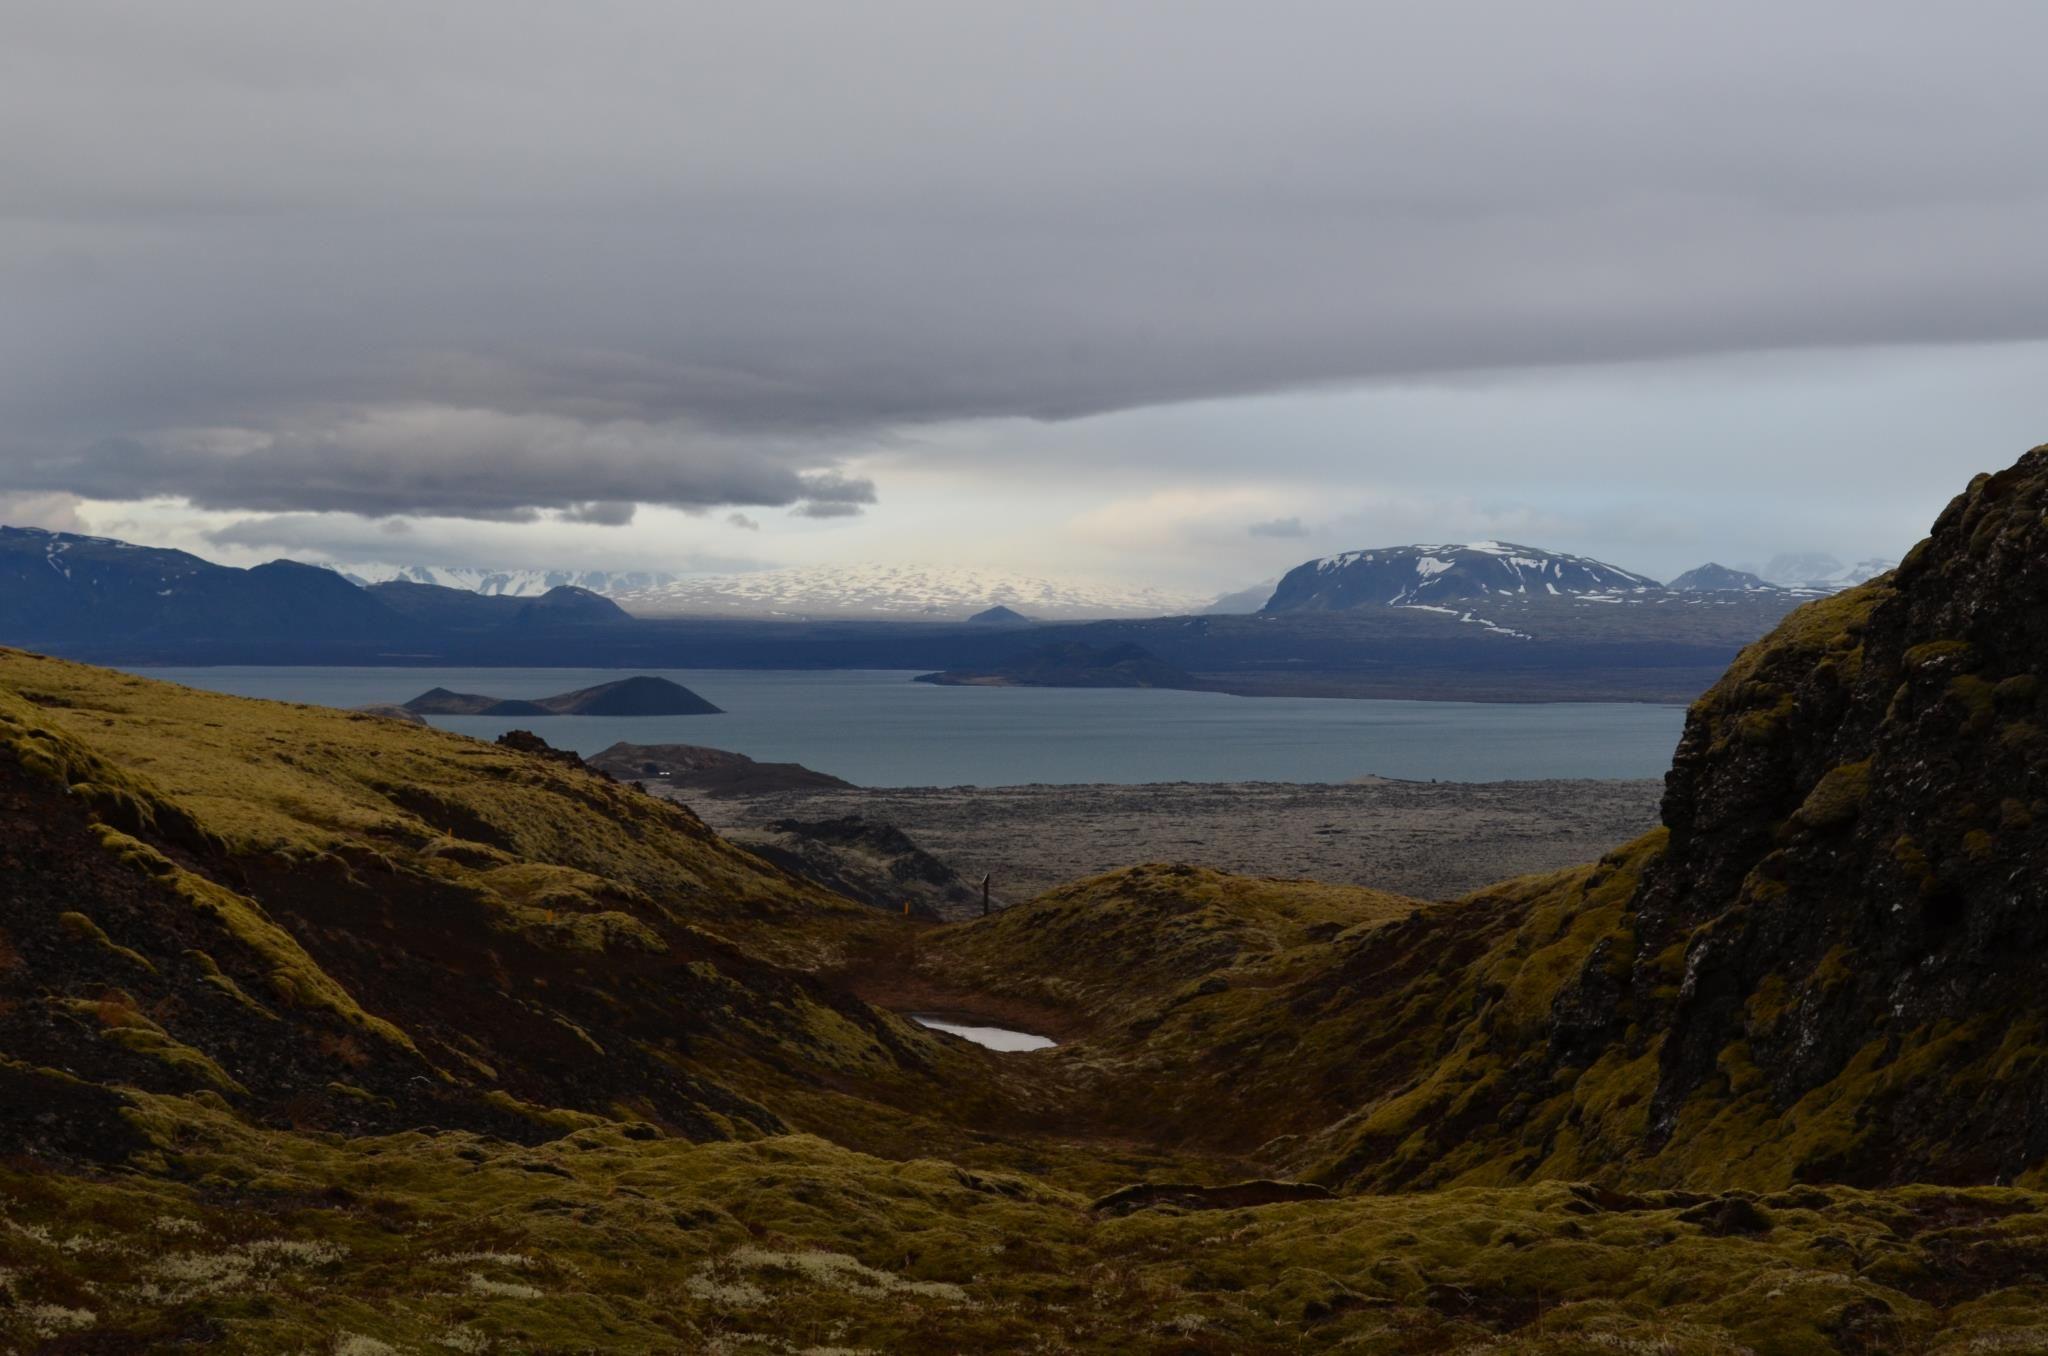 Iceland, Snaefellsness; it's like a fairytale..